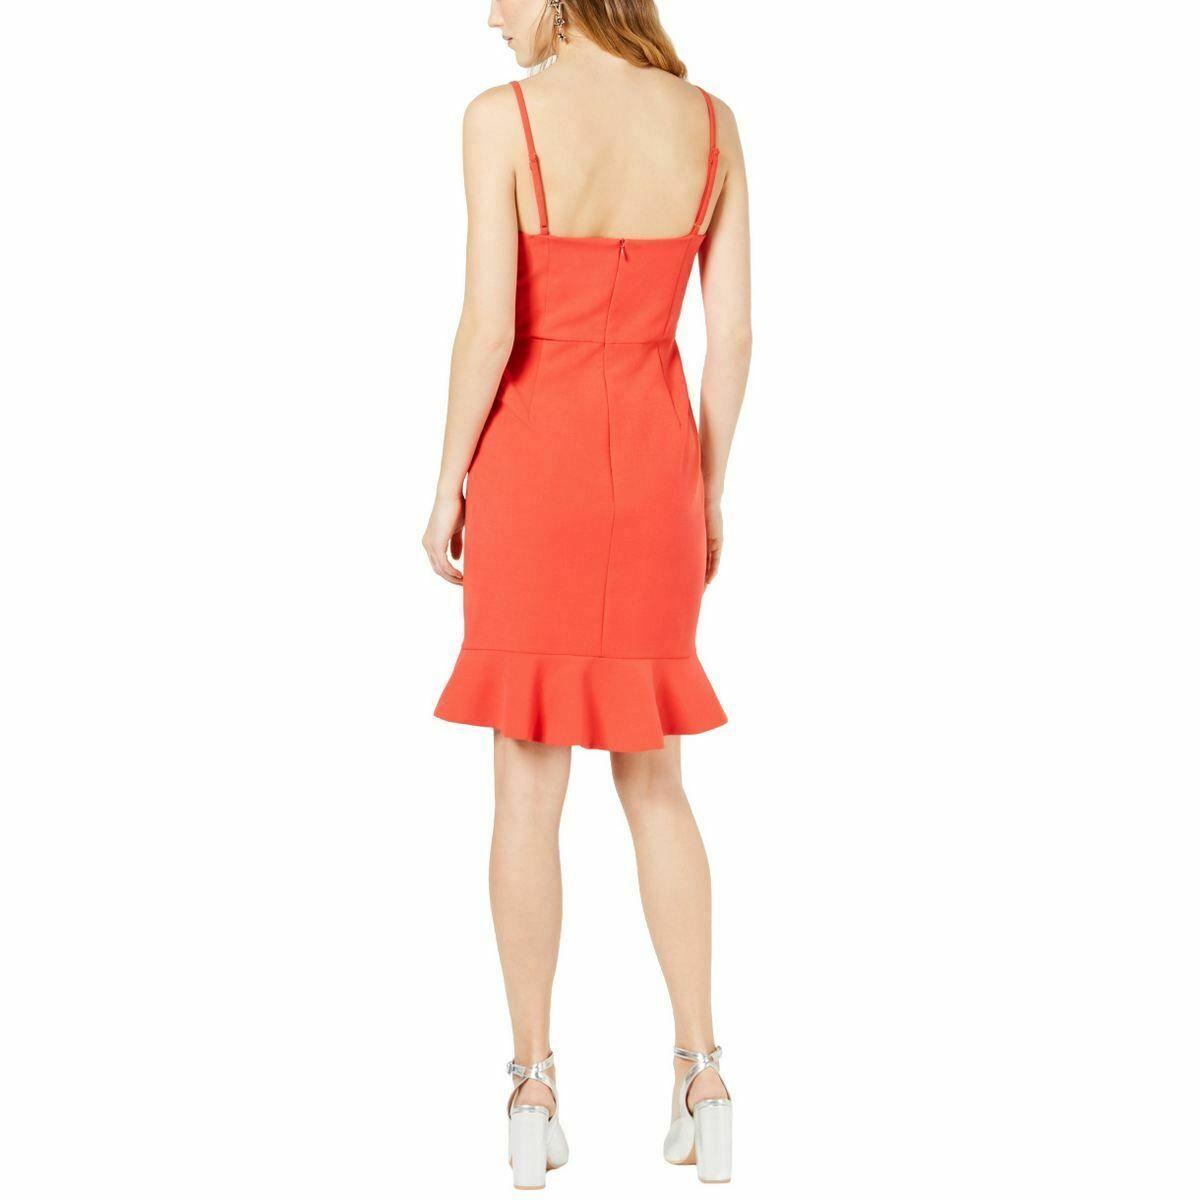 French Connection Women's Dress Red Size 2 Ruffle Flounce Sheath